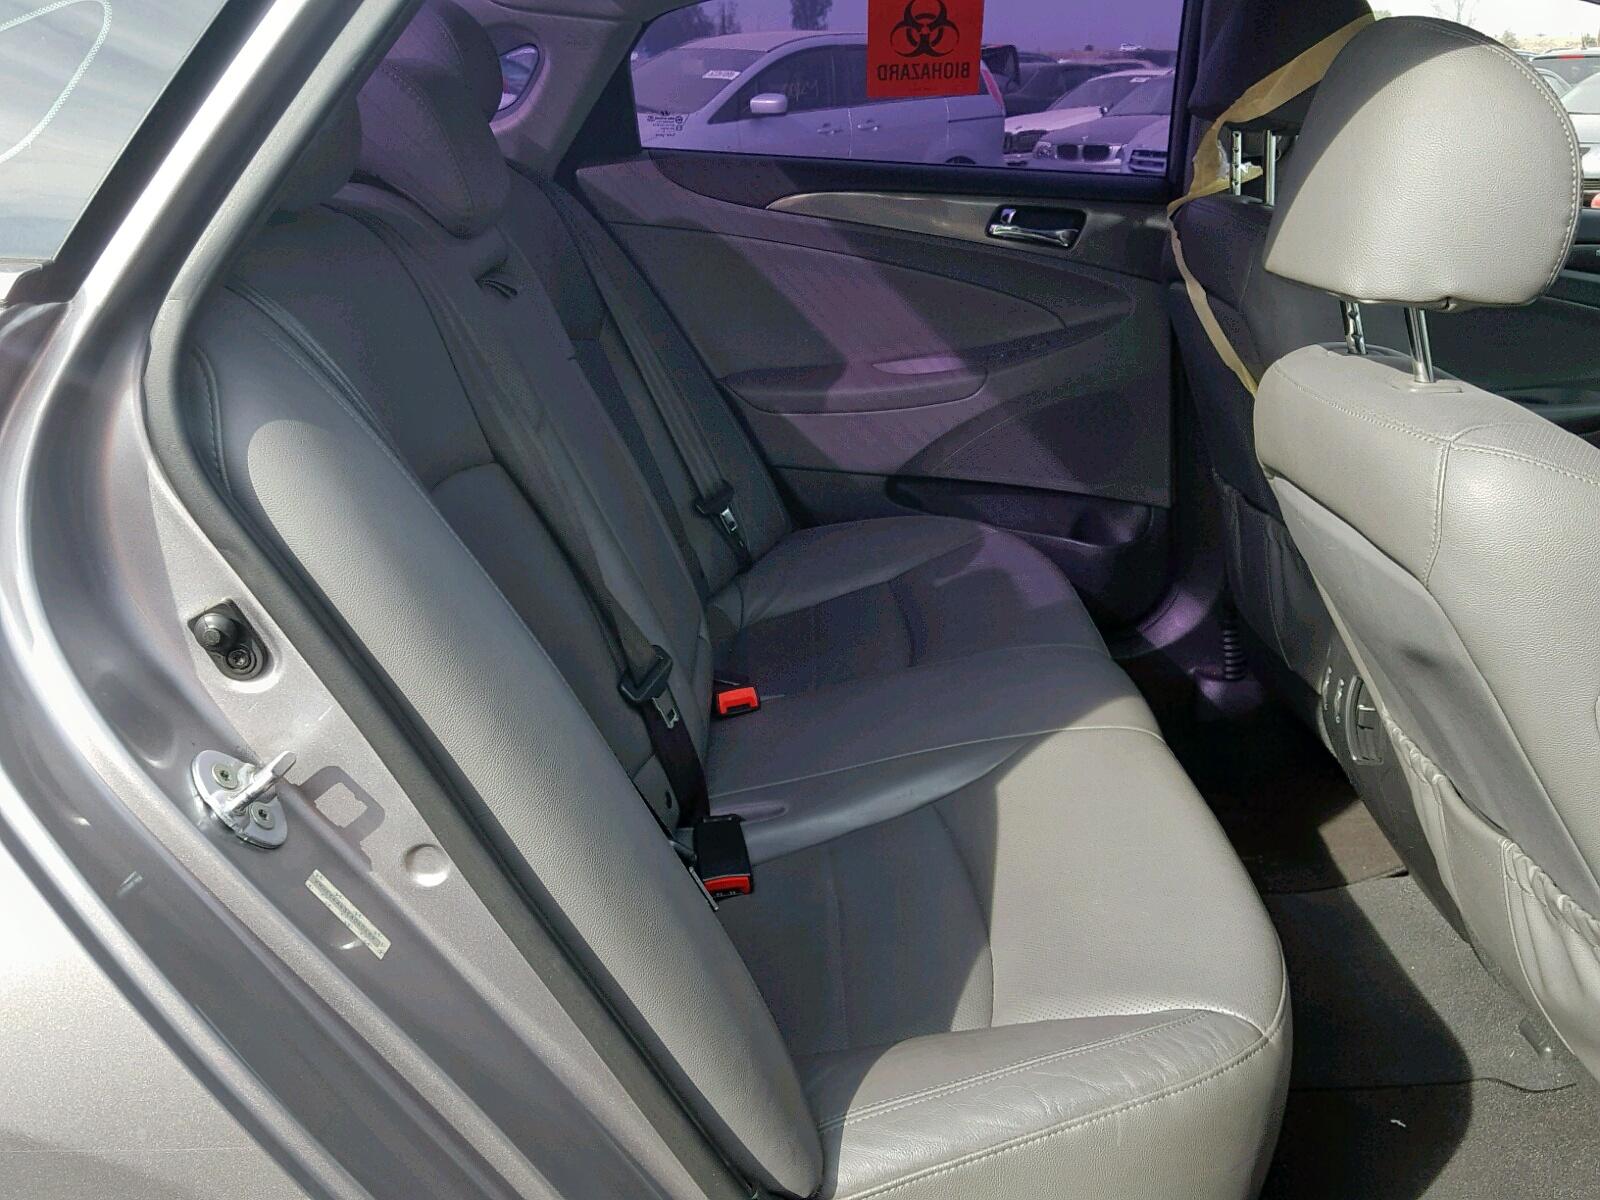 2012 Hyundai Sonata Hyb 2.4L detail view